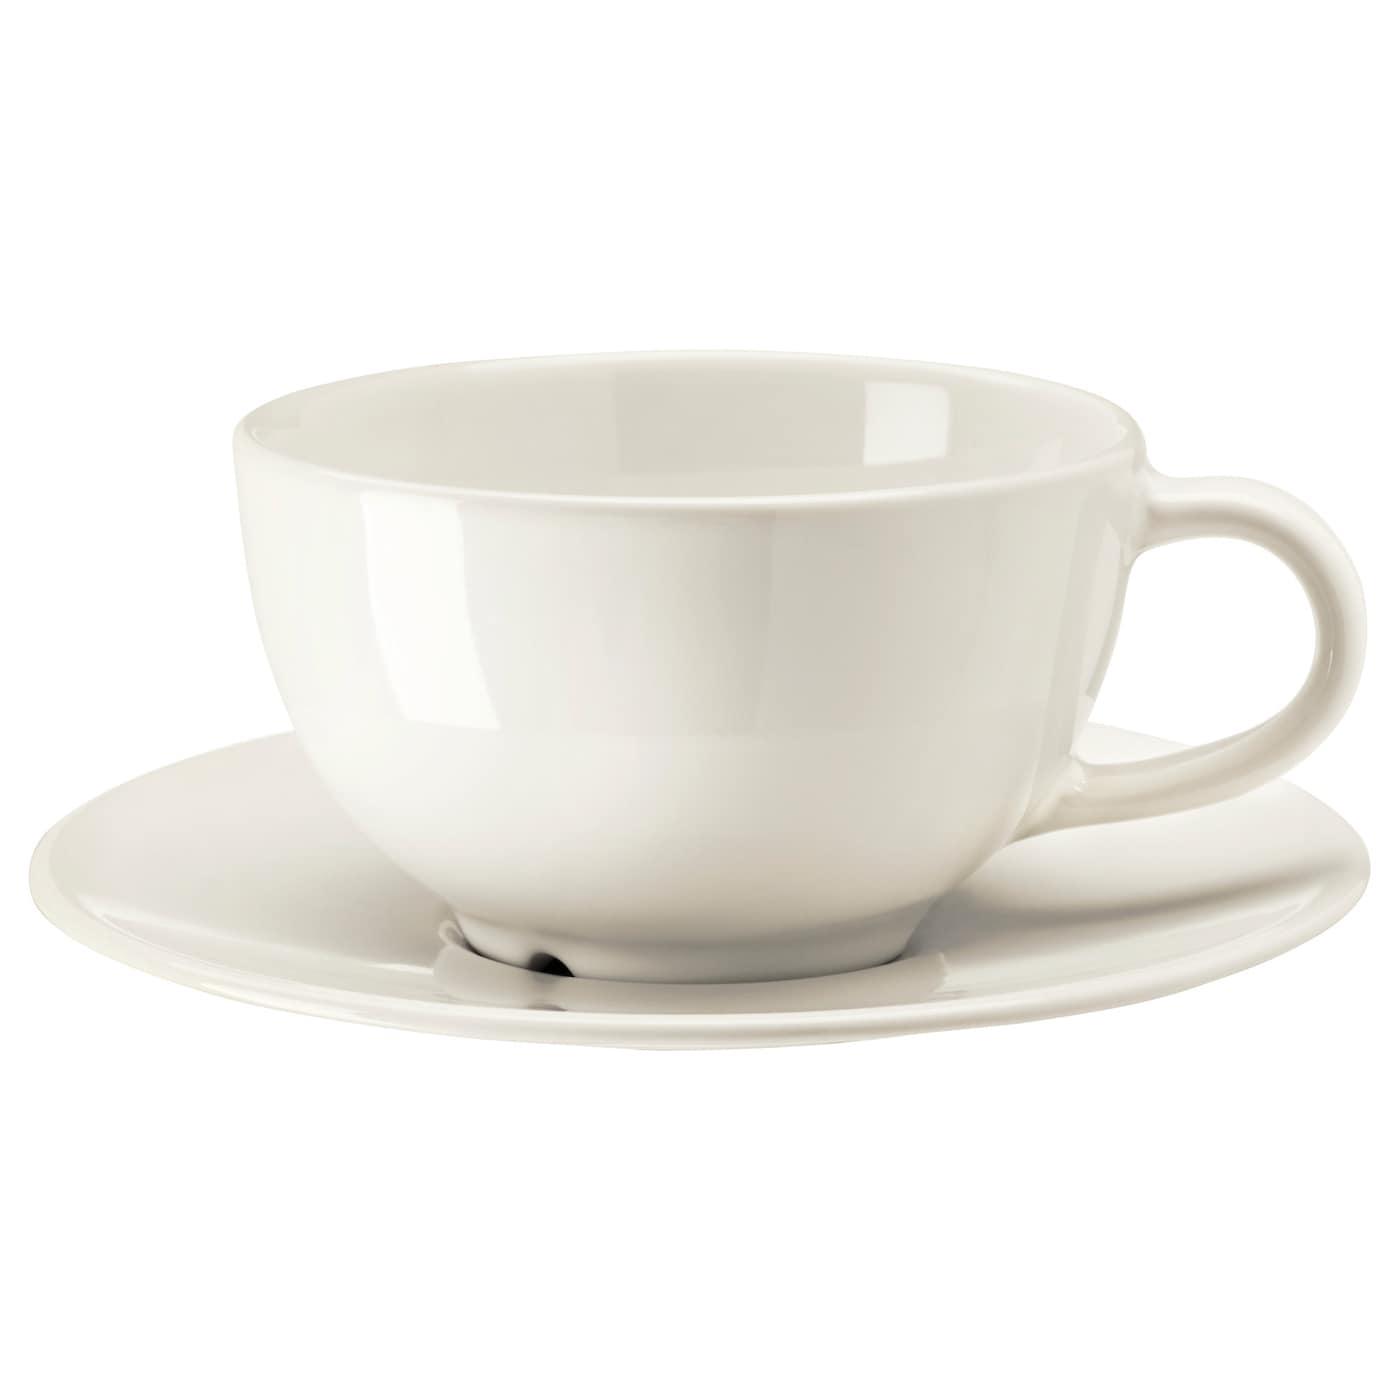 Ikea Vardagen Teacup With Saucer